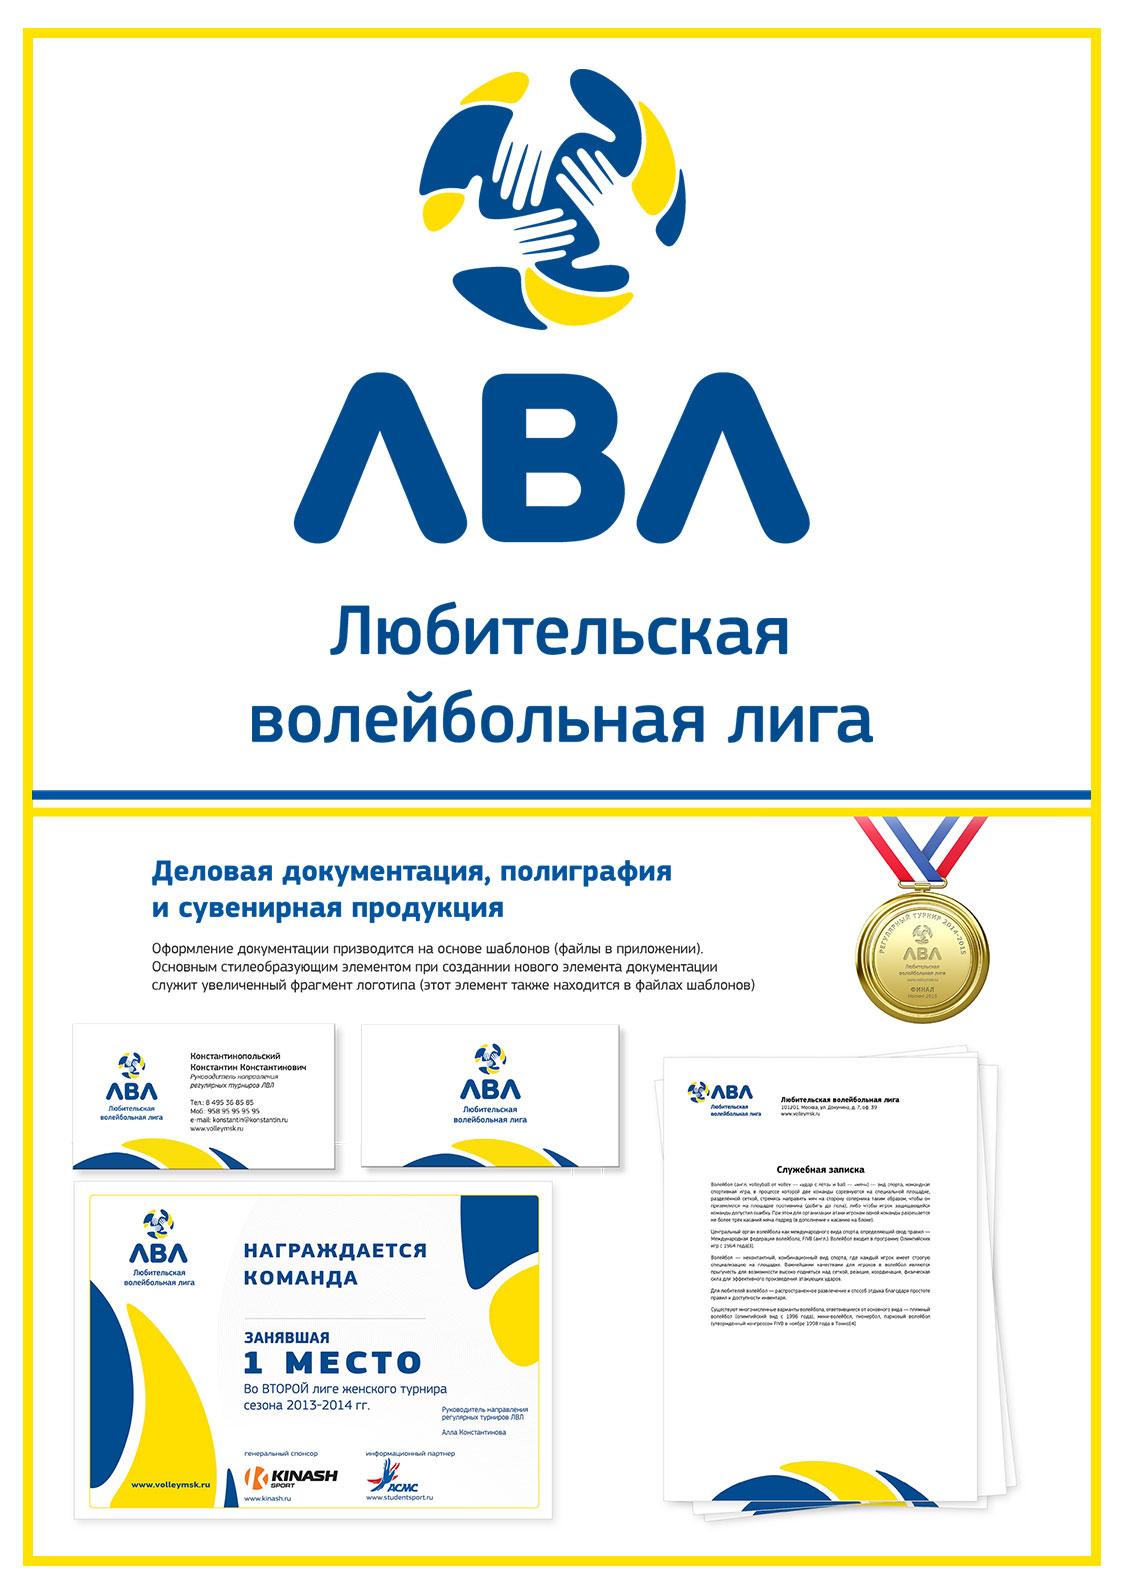 Логотип+фирменный стиль+гайдлайн для спортивной компании ЛВЛ